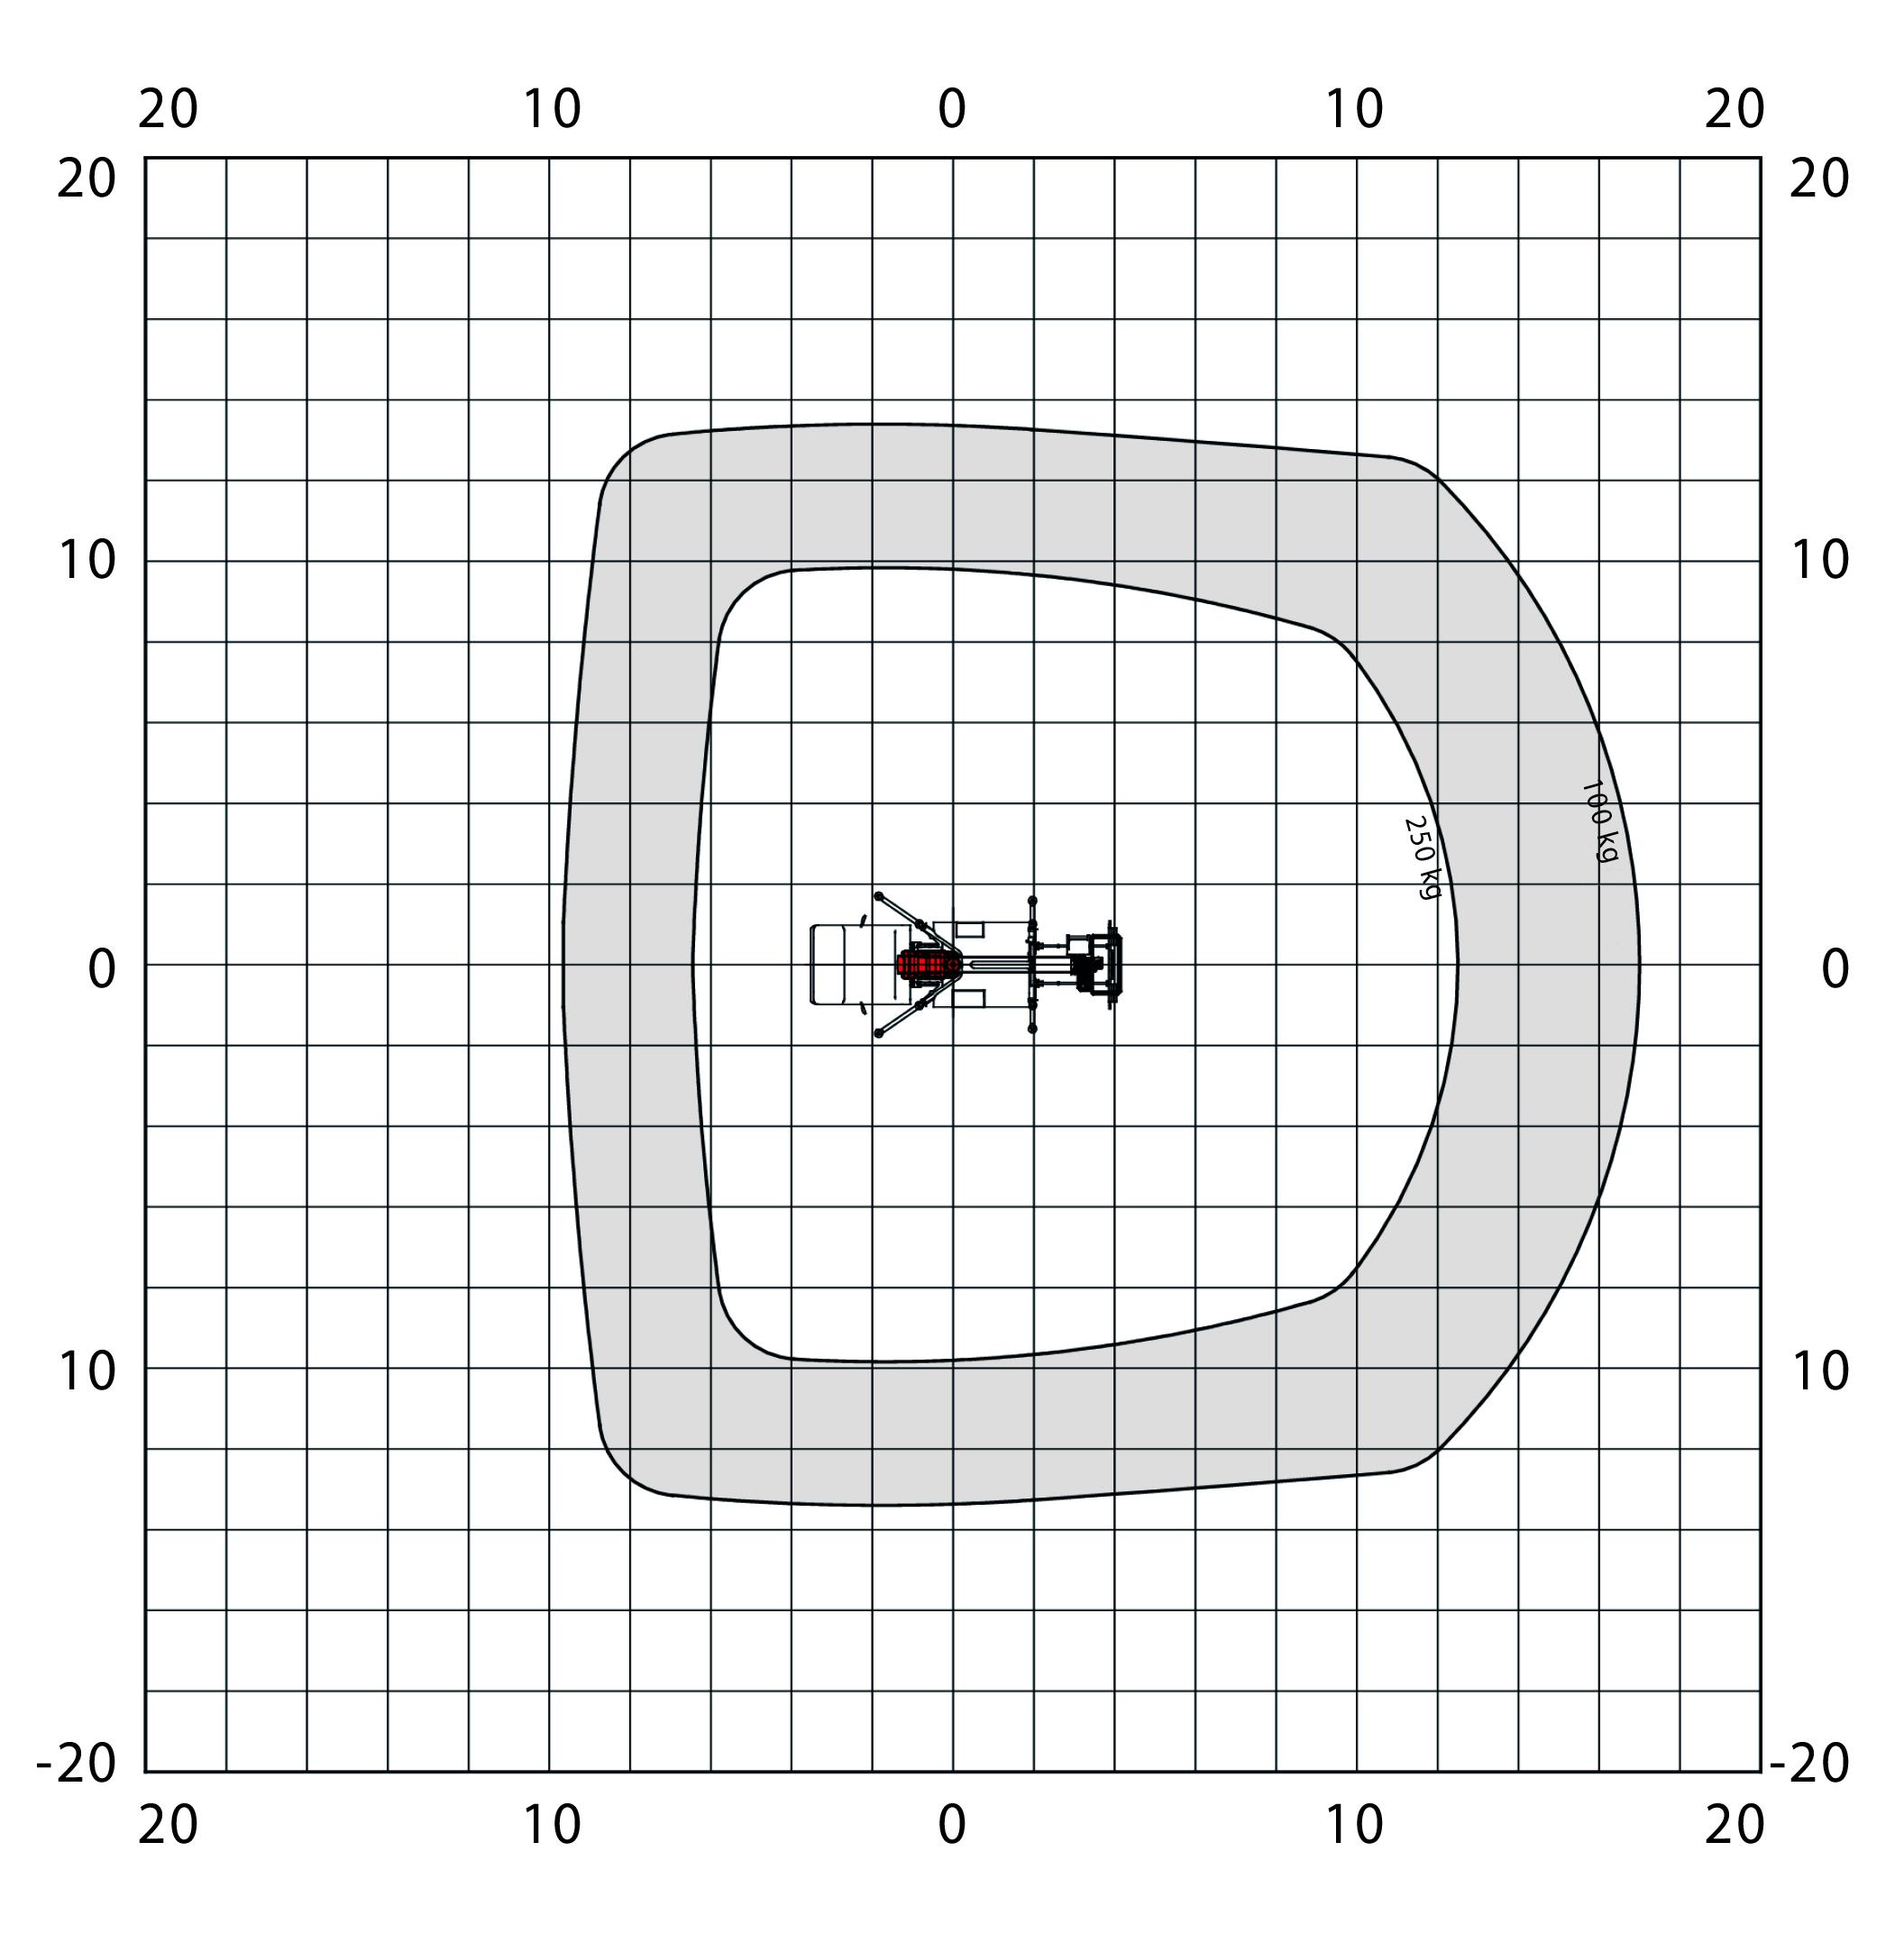 P 250 BK Arbeitsdiagramm 2